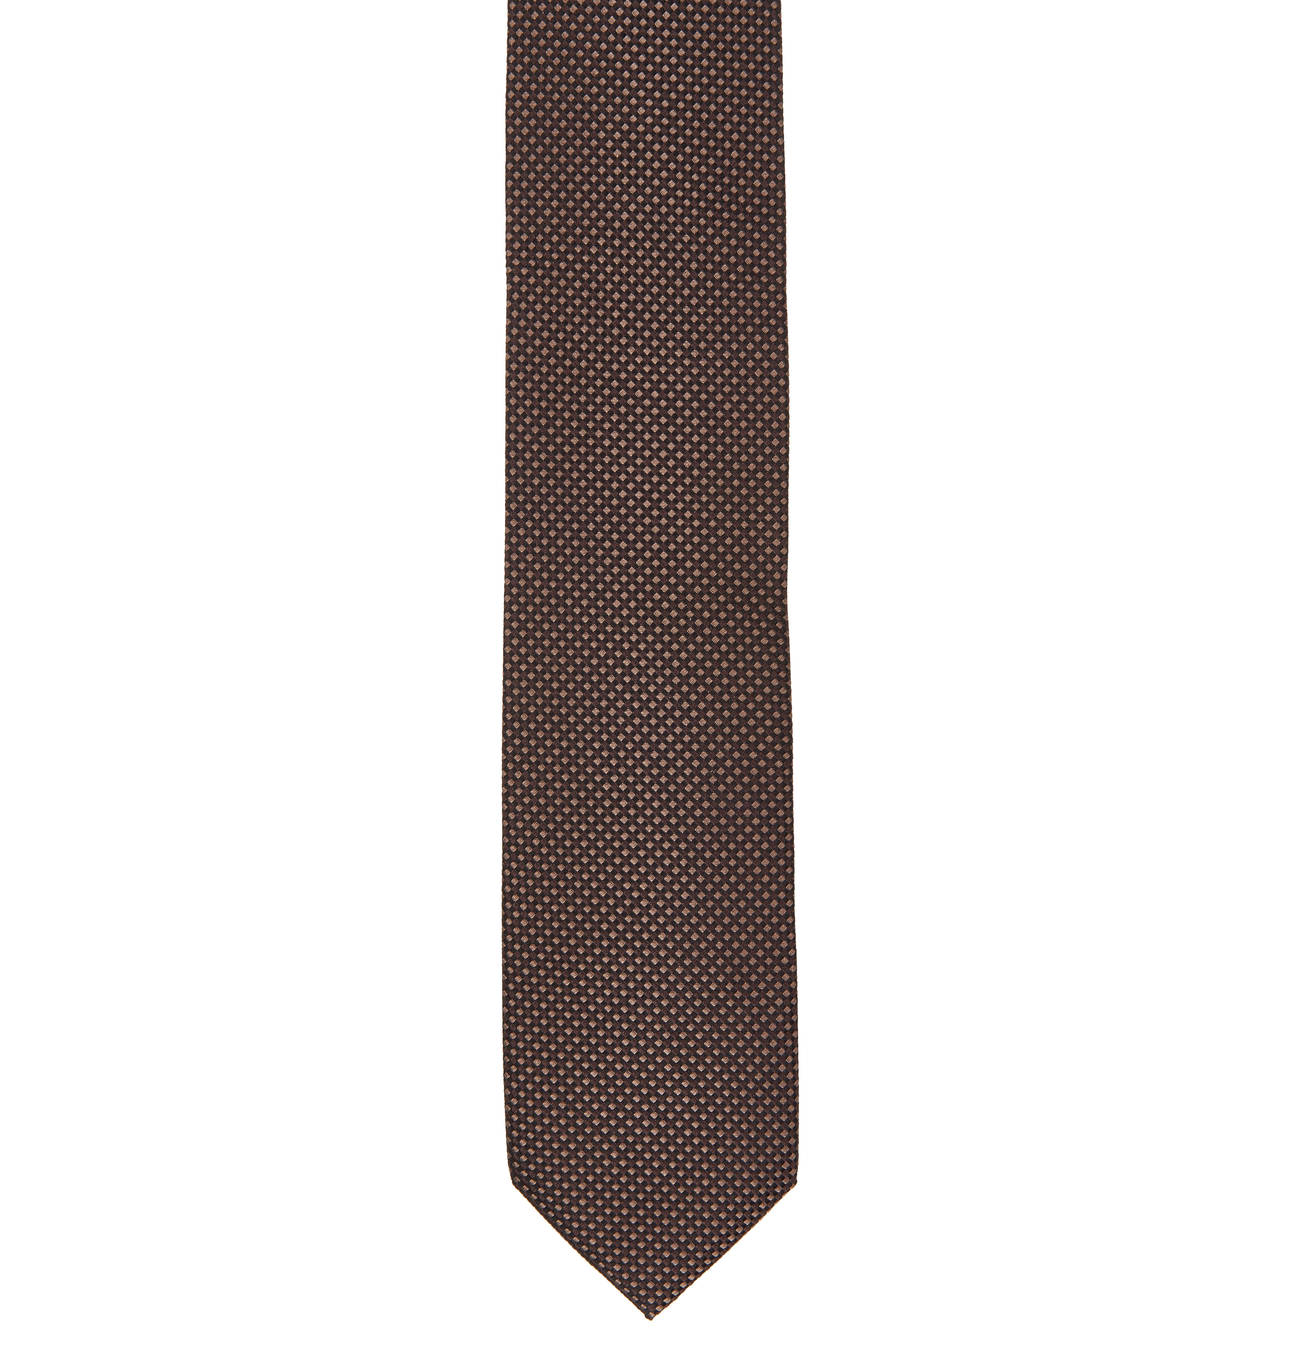 Krawatte im Rauten Muster